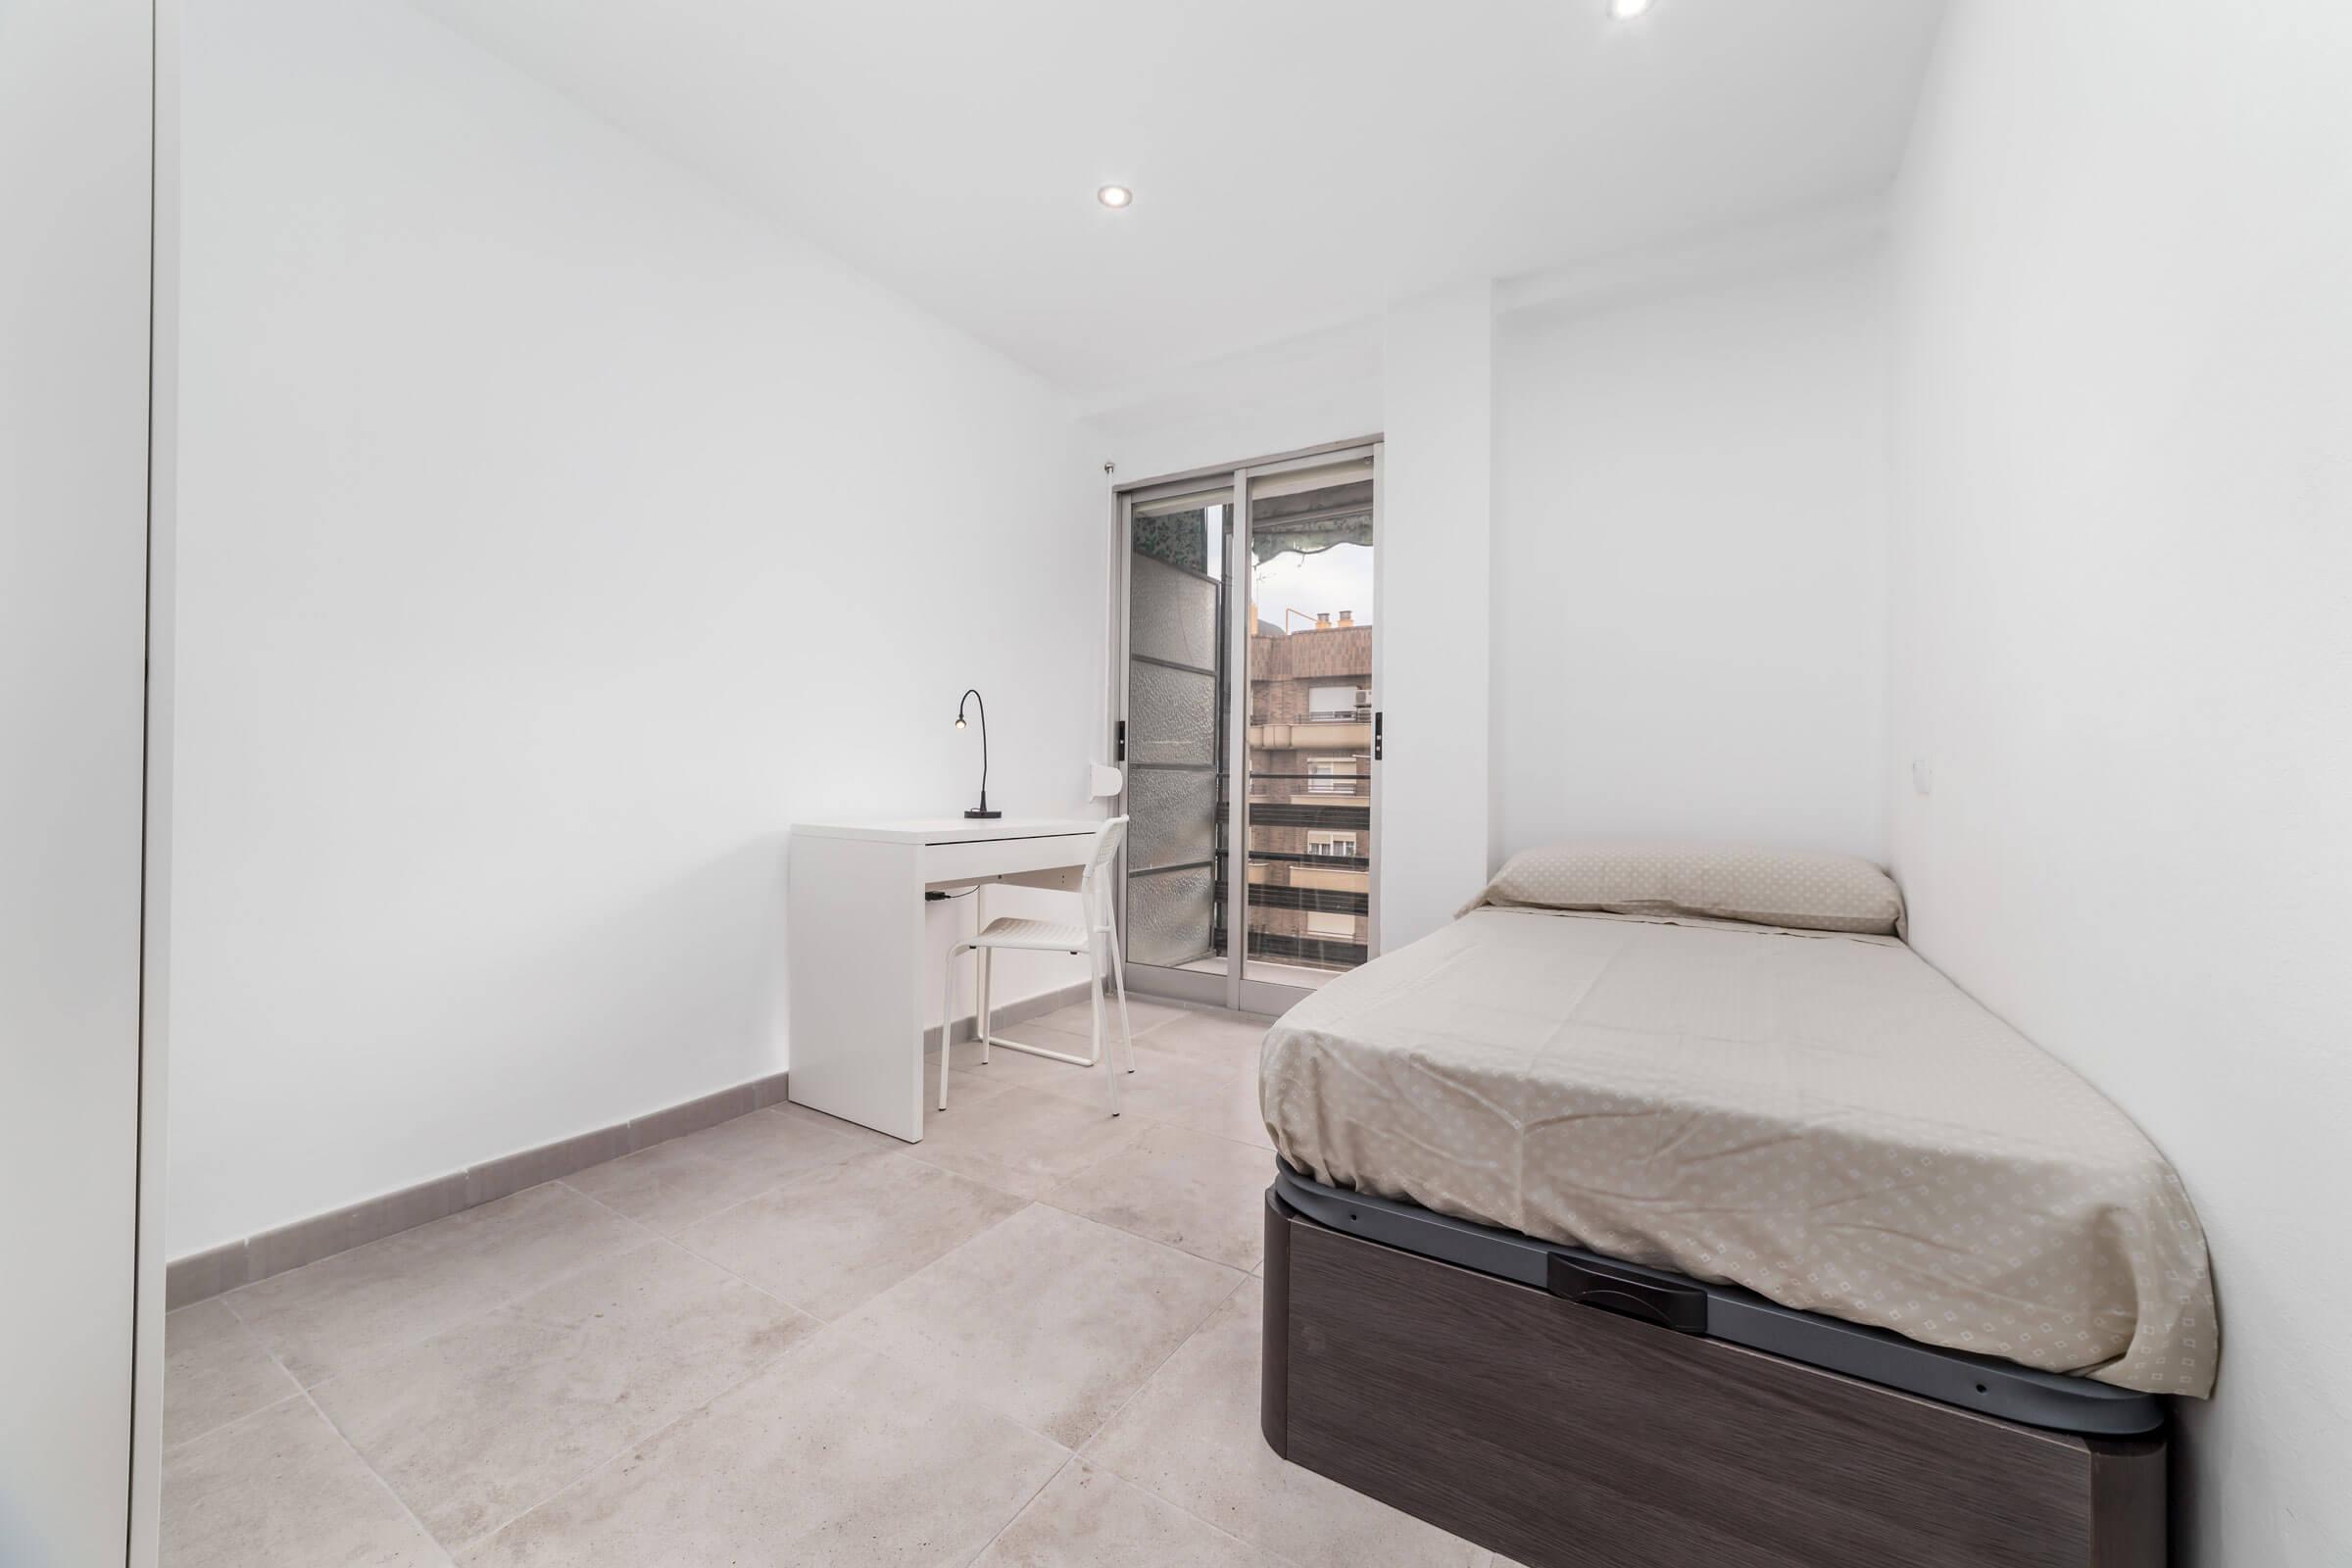 Single bedroom with balcony